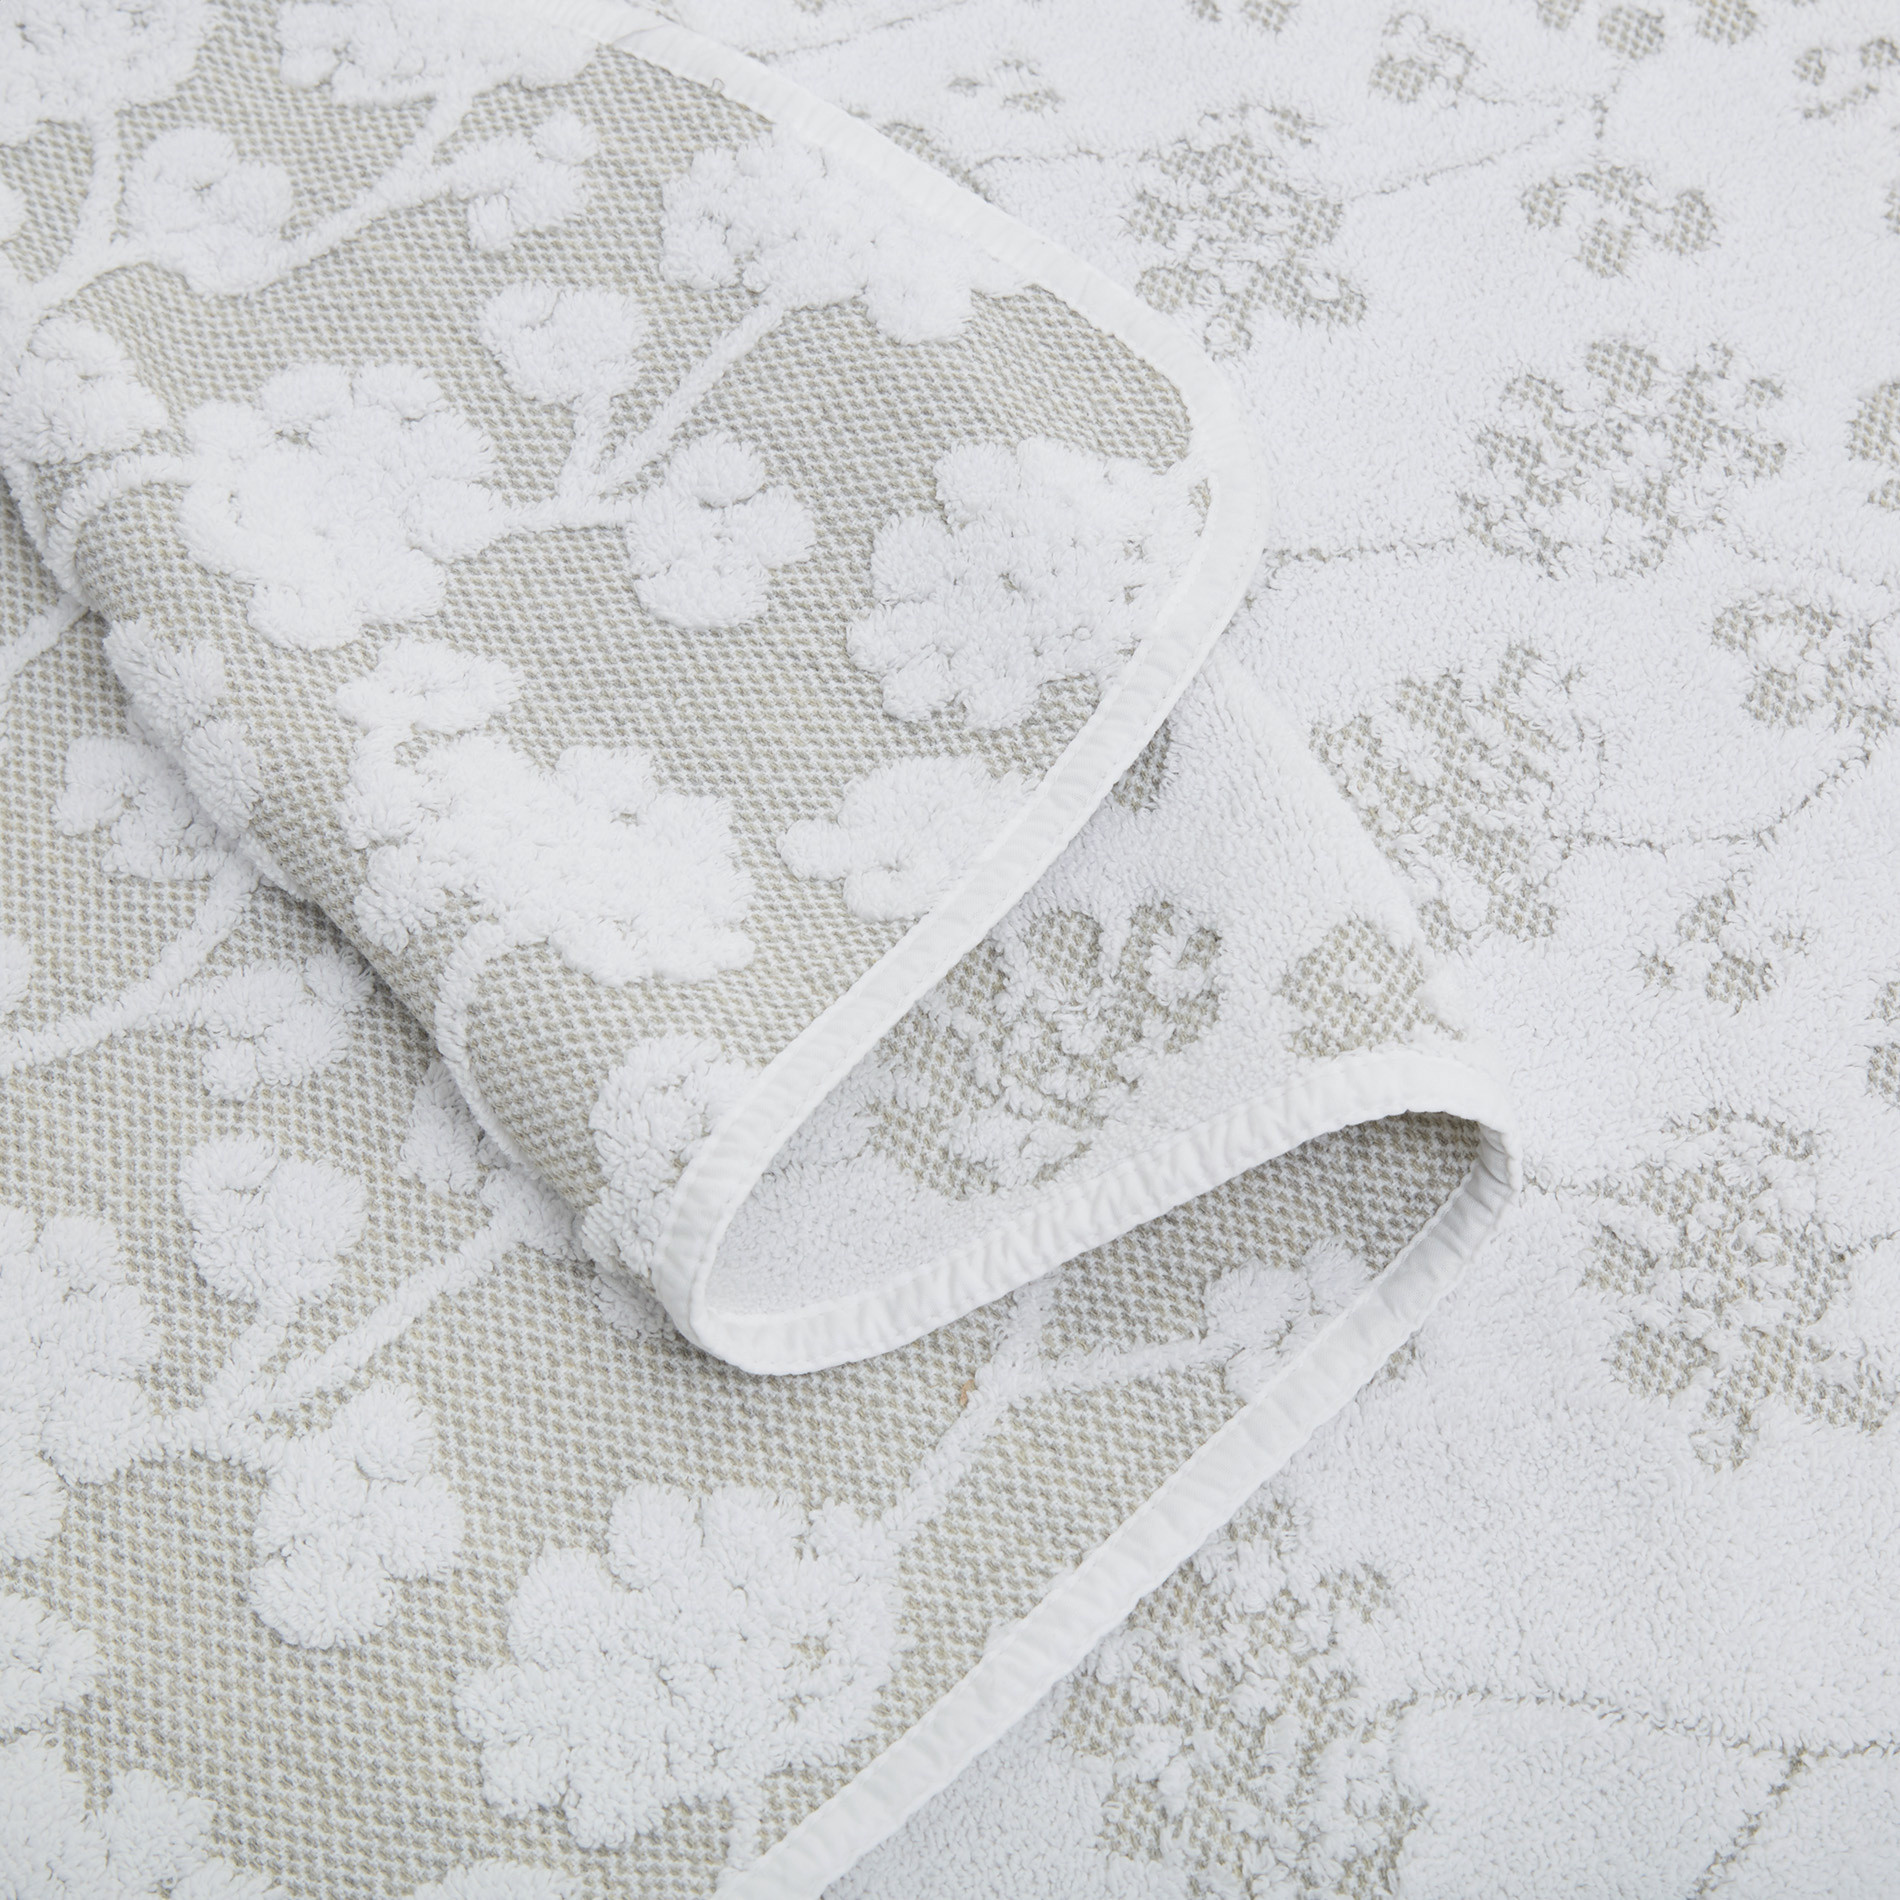 Asciugamano puro cotone a fiori Thermae, Beige chiaro, large image number 3